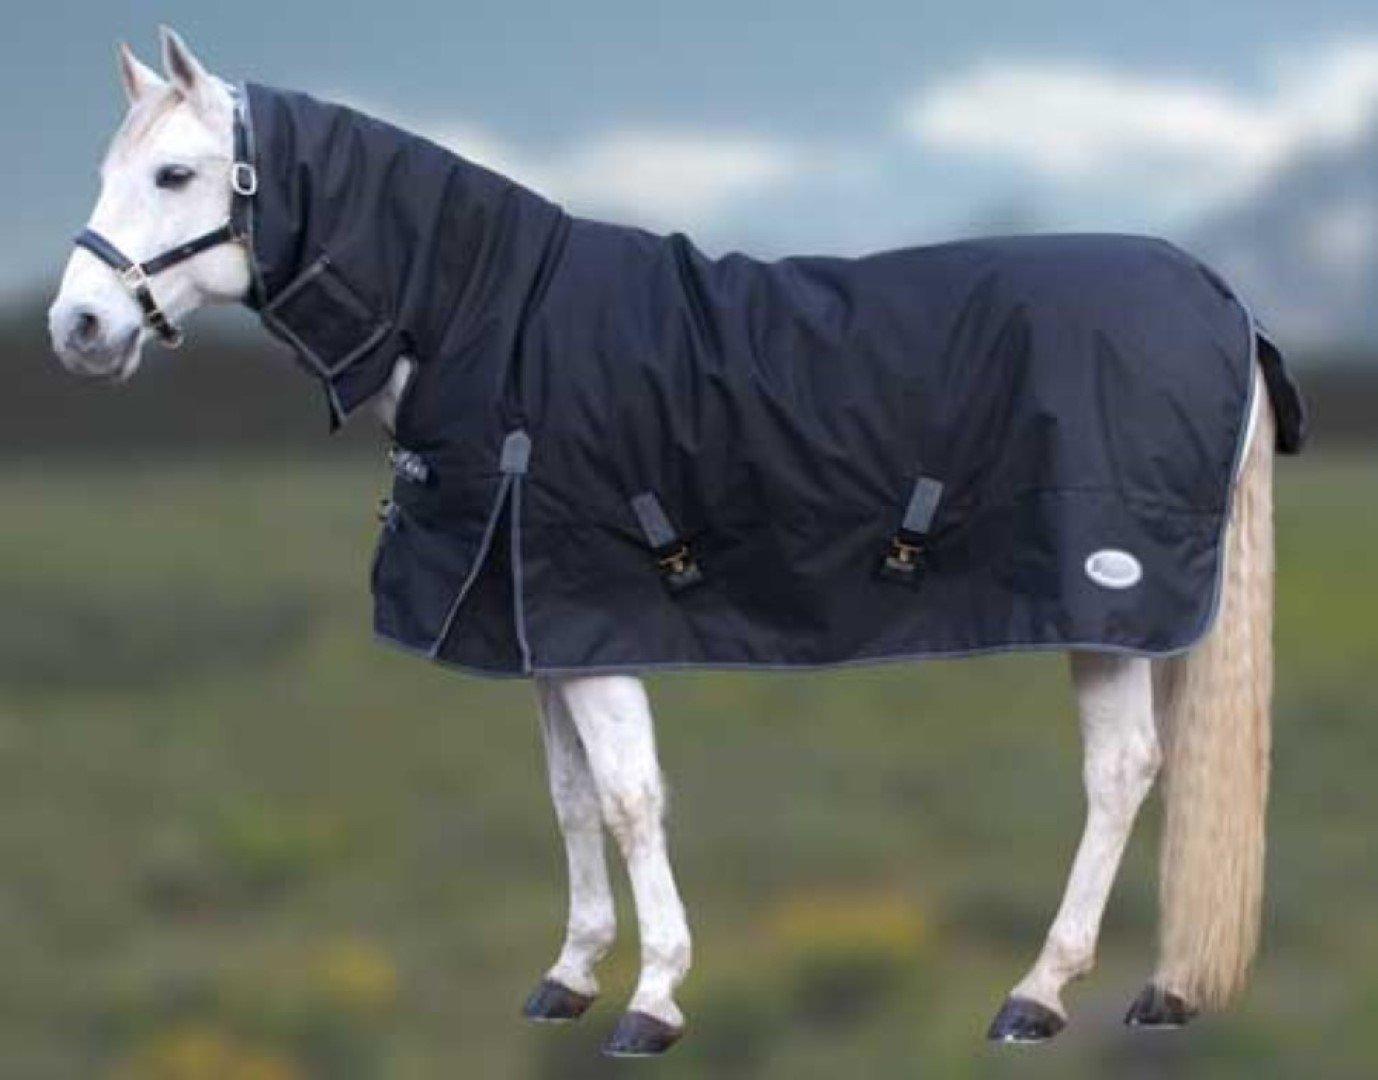 Burgundy black 6'0\ Burgundy black 6'0\ Rhinegold Full Neck Konig Outdoor Horse Rug